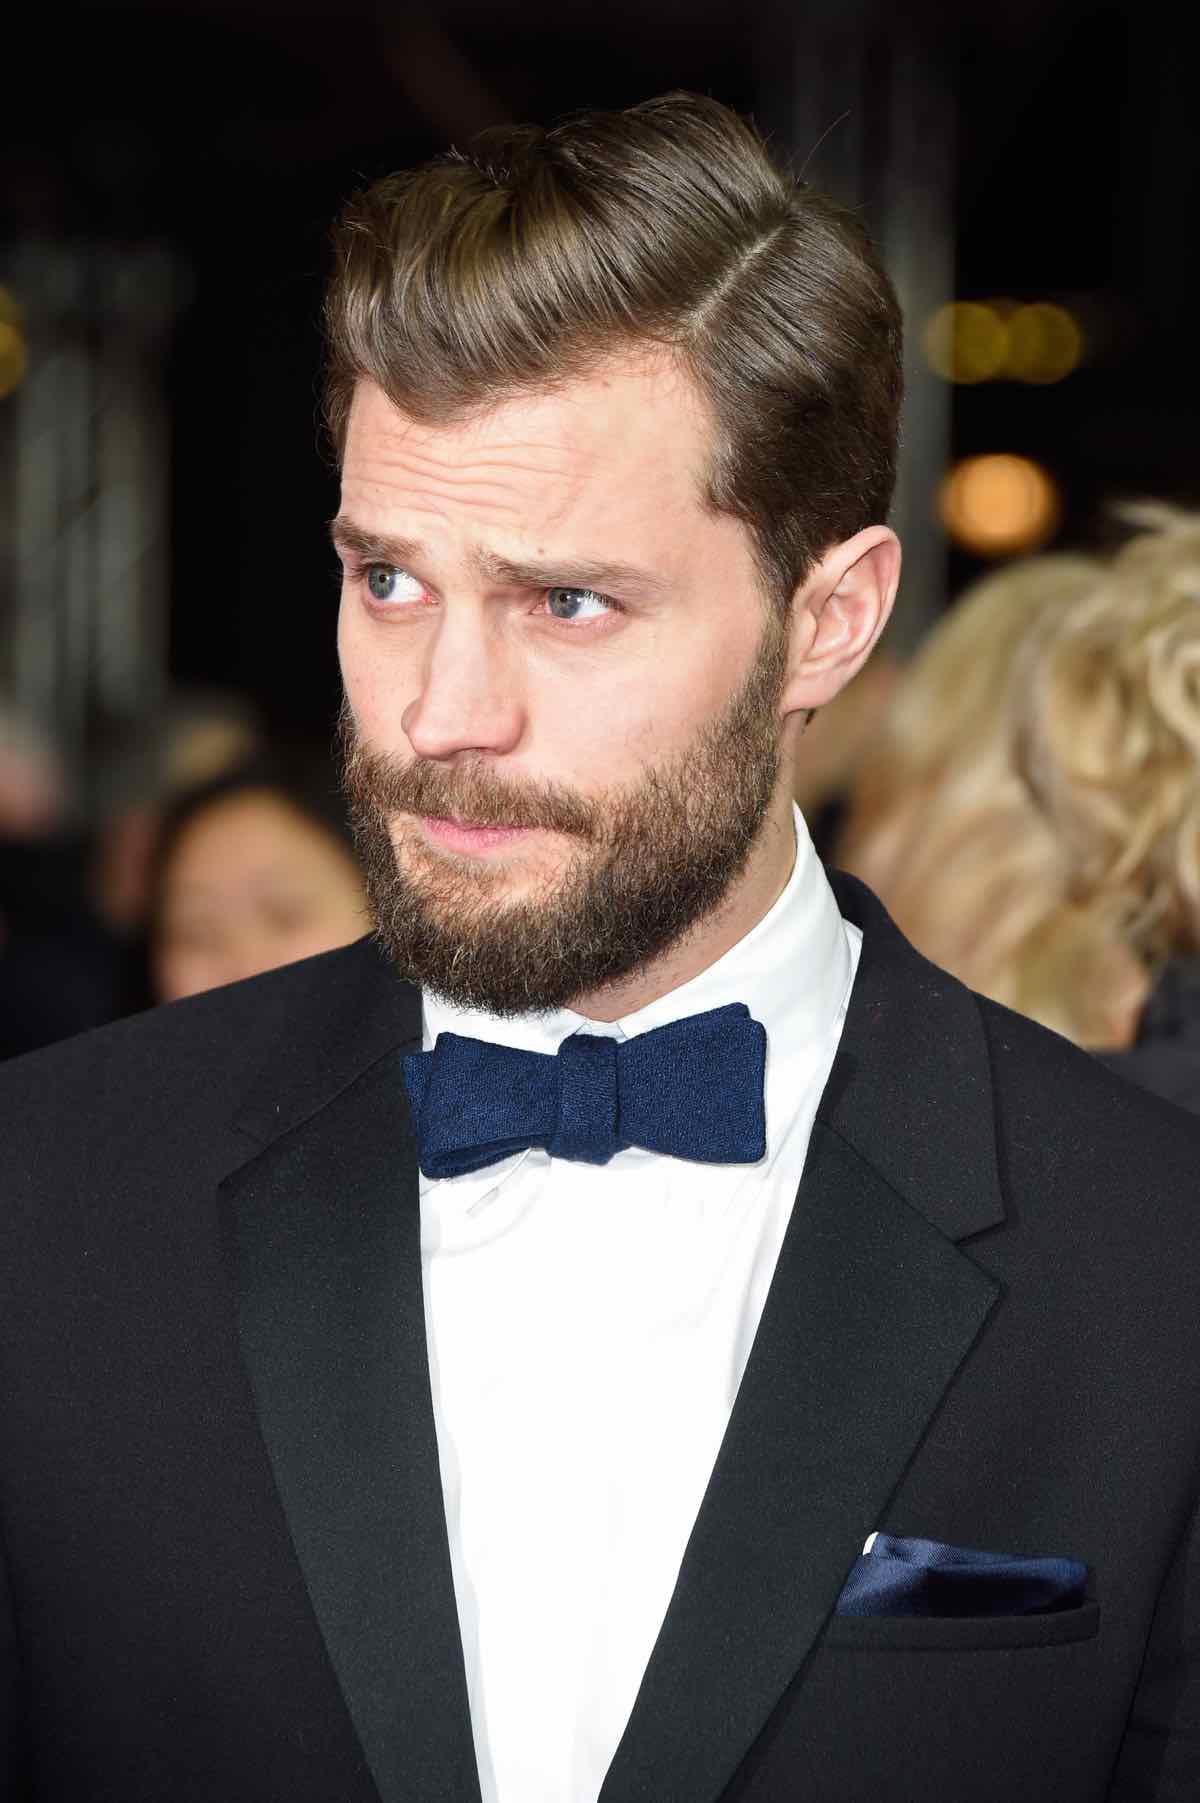 Jamie Dornan 'Fifty Shades of Grey' Premiere - 65th Berlinale International Film Festival